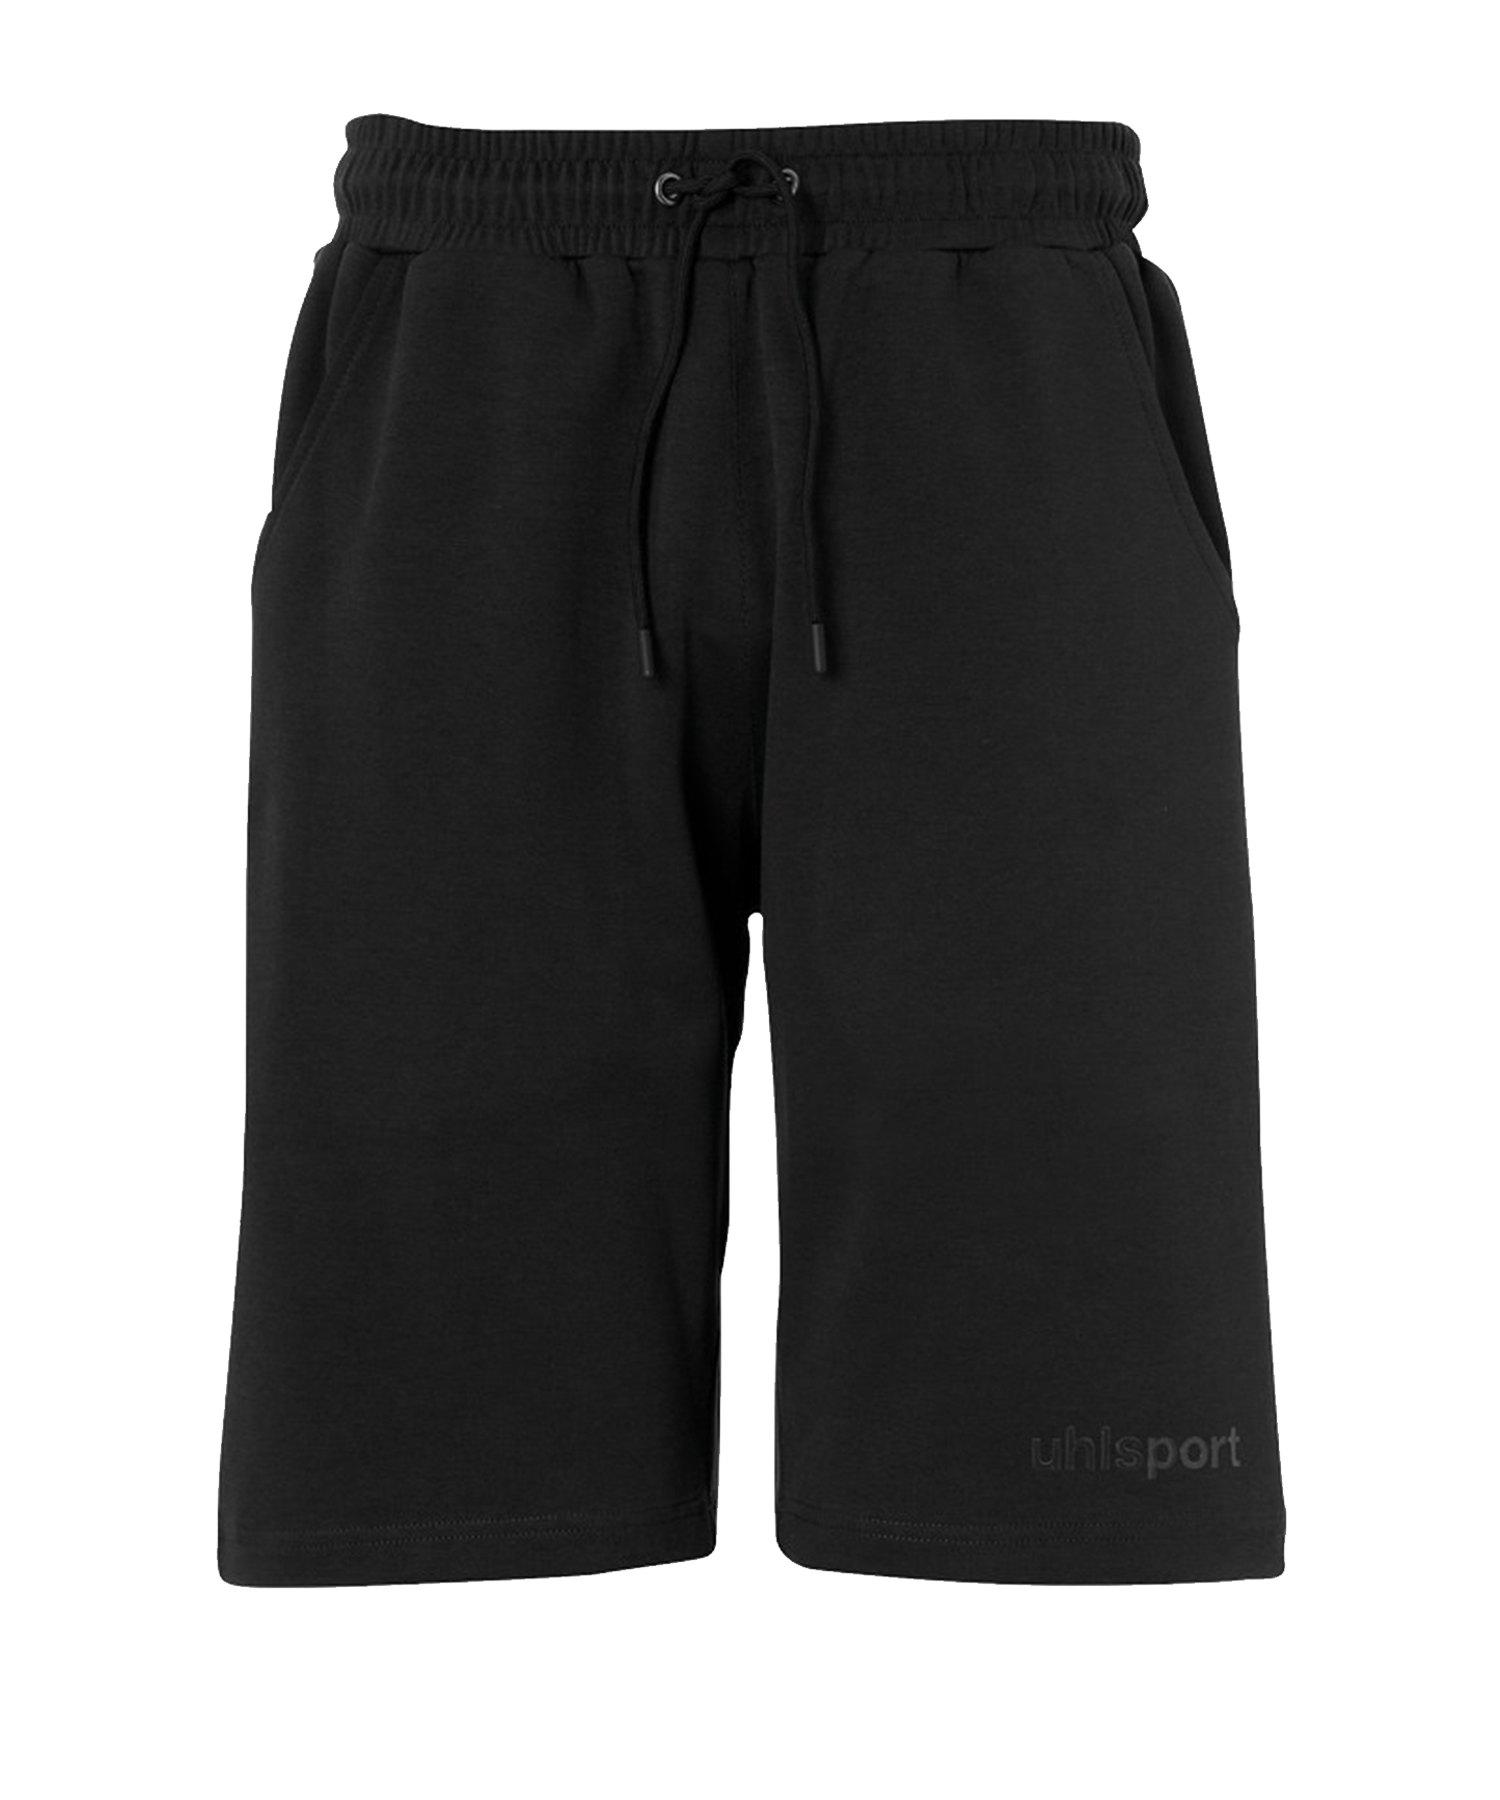 Uhlsport Essential Pro Short Hose kurz Kids F01 - Schwarz